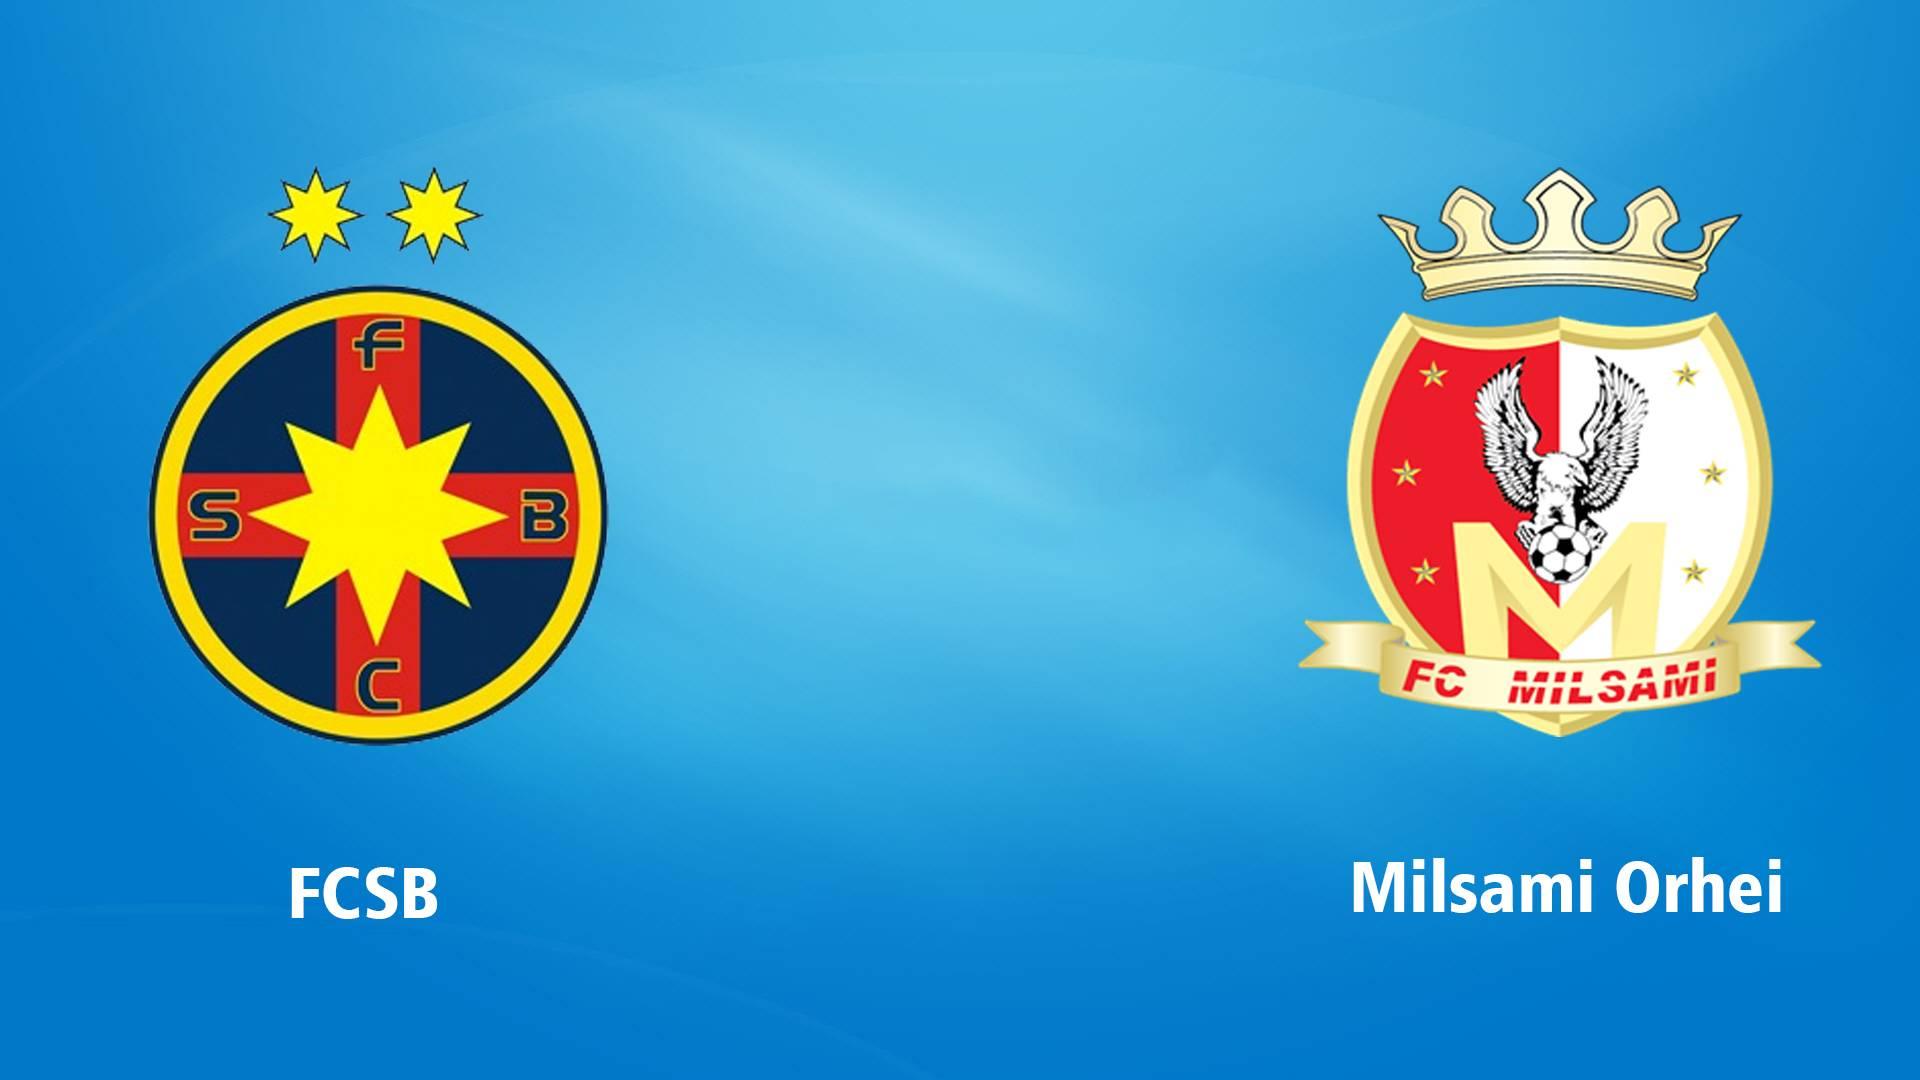 FCSB - MILSAMI ORHEI LIVE PRO TV PRELIMINARII EUROPA LEAGUE